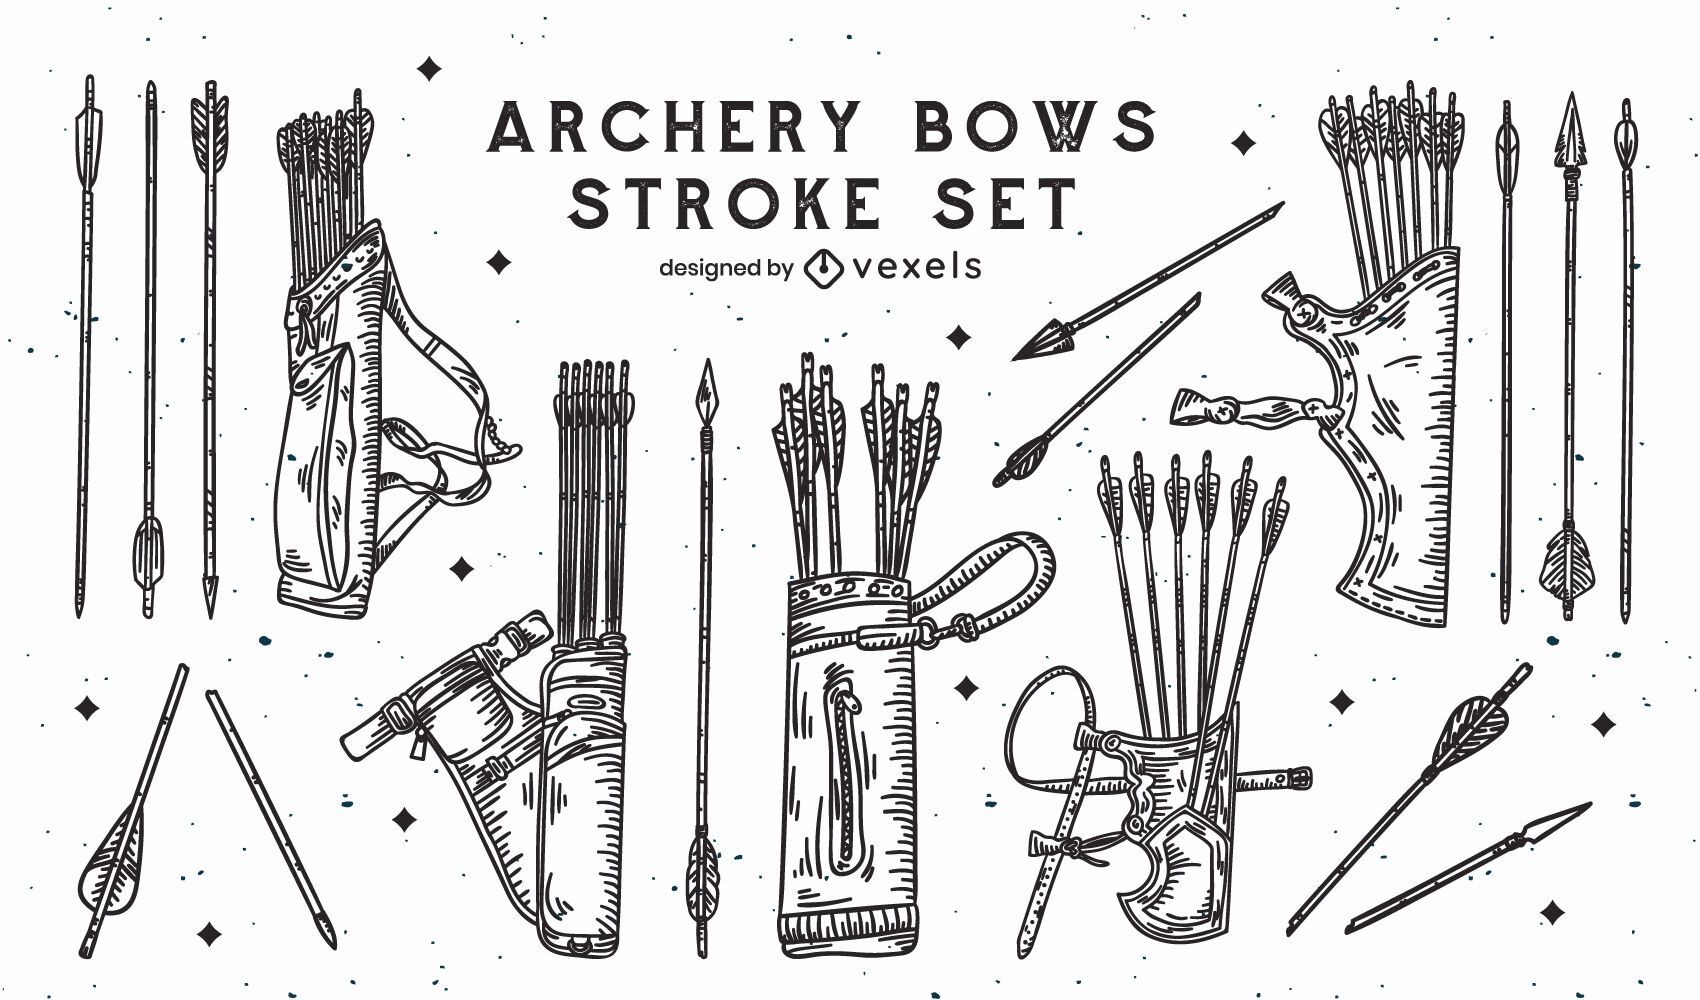 Bow and arrows archery stroke set